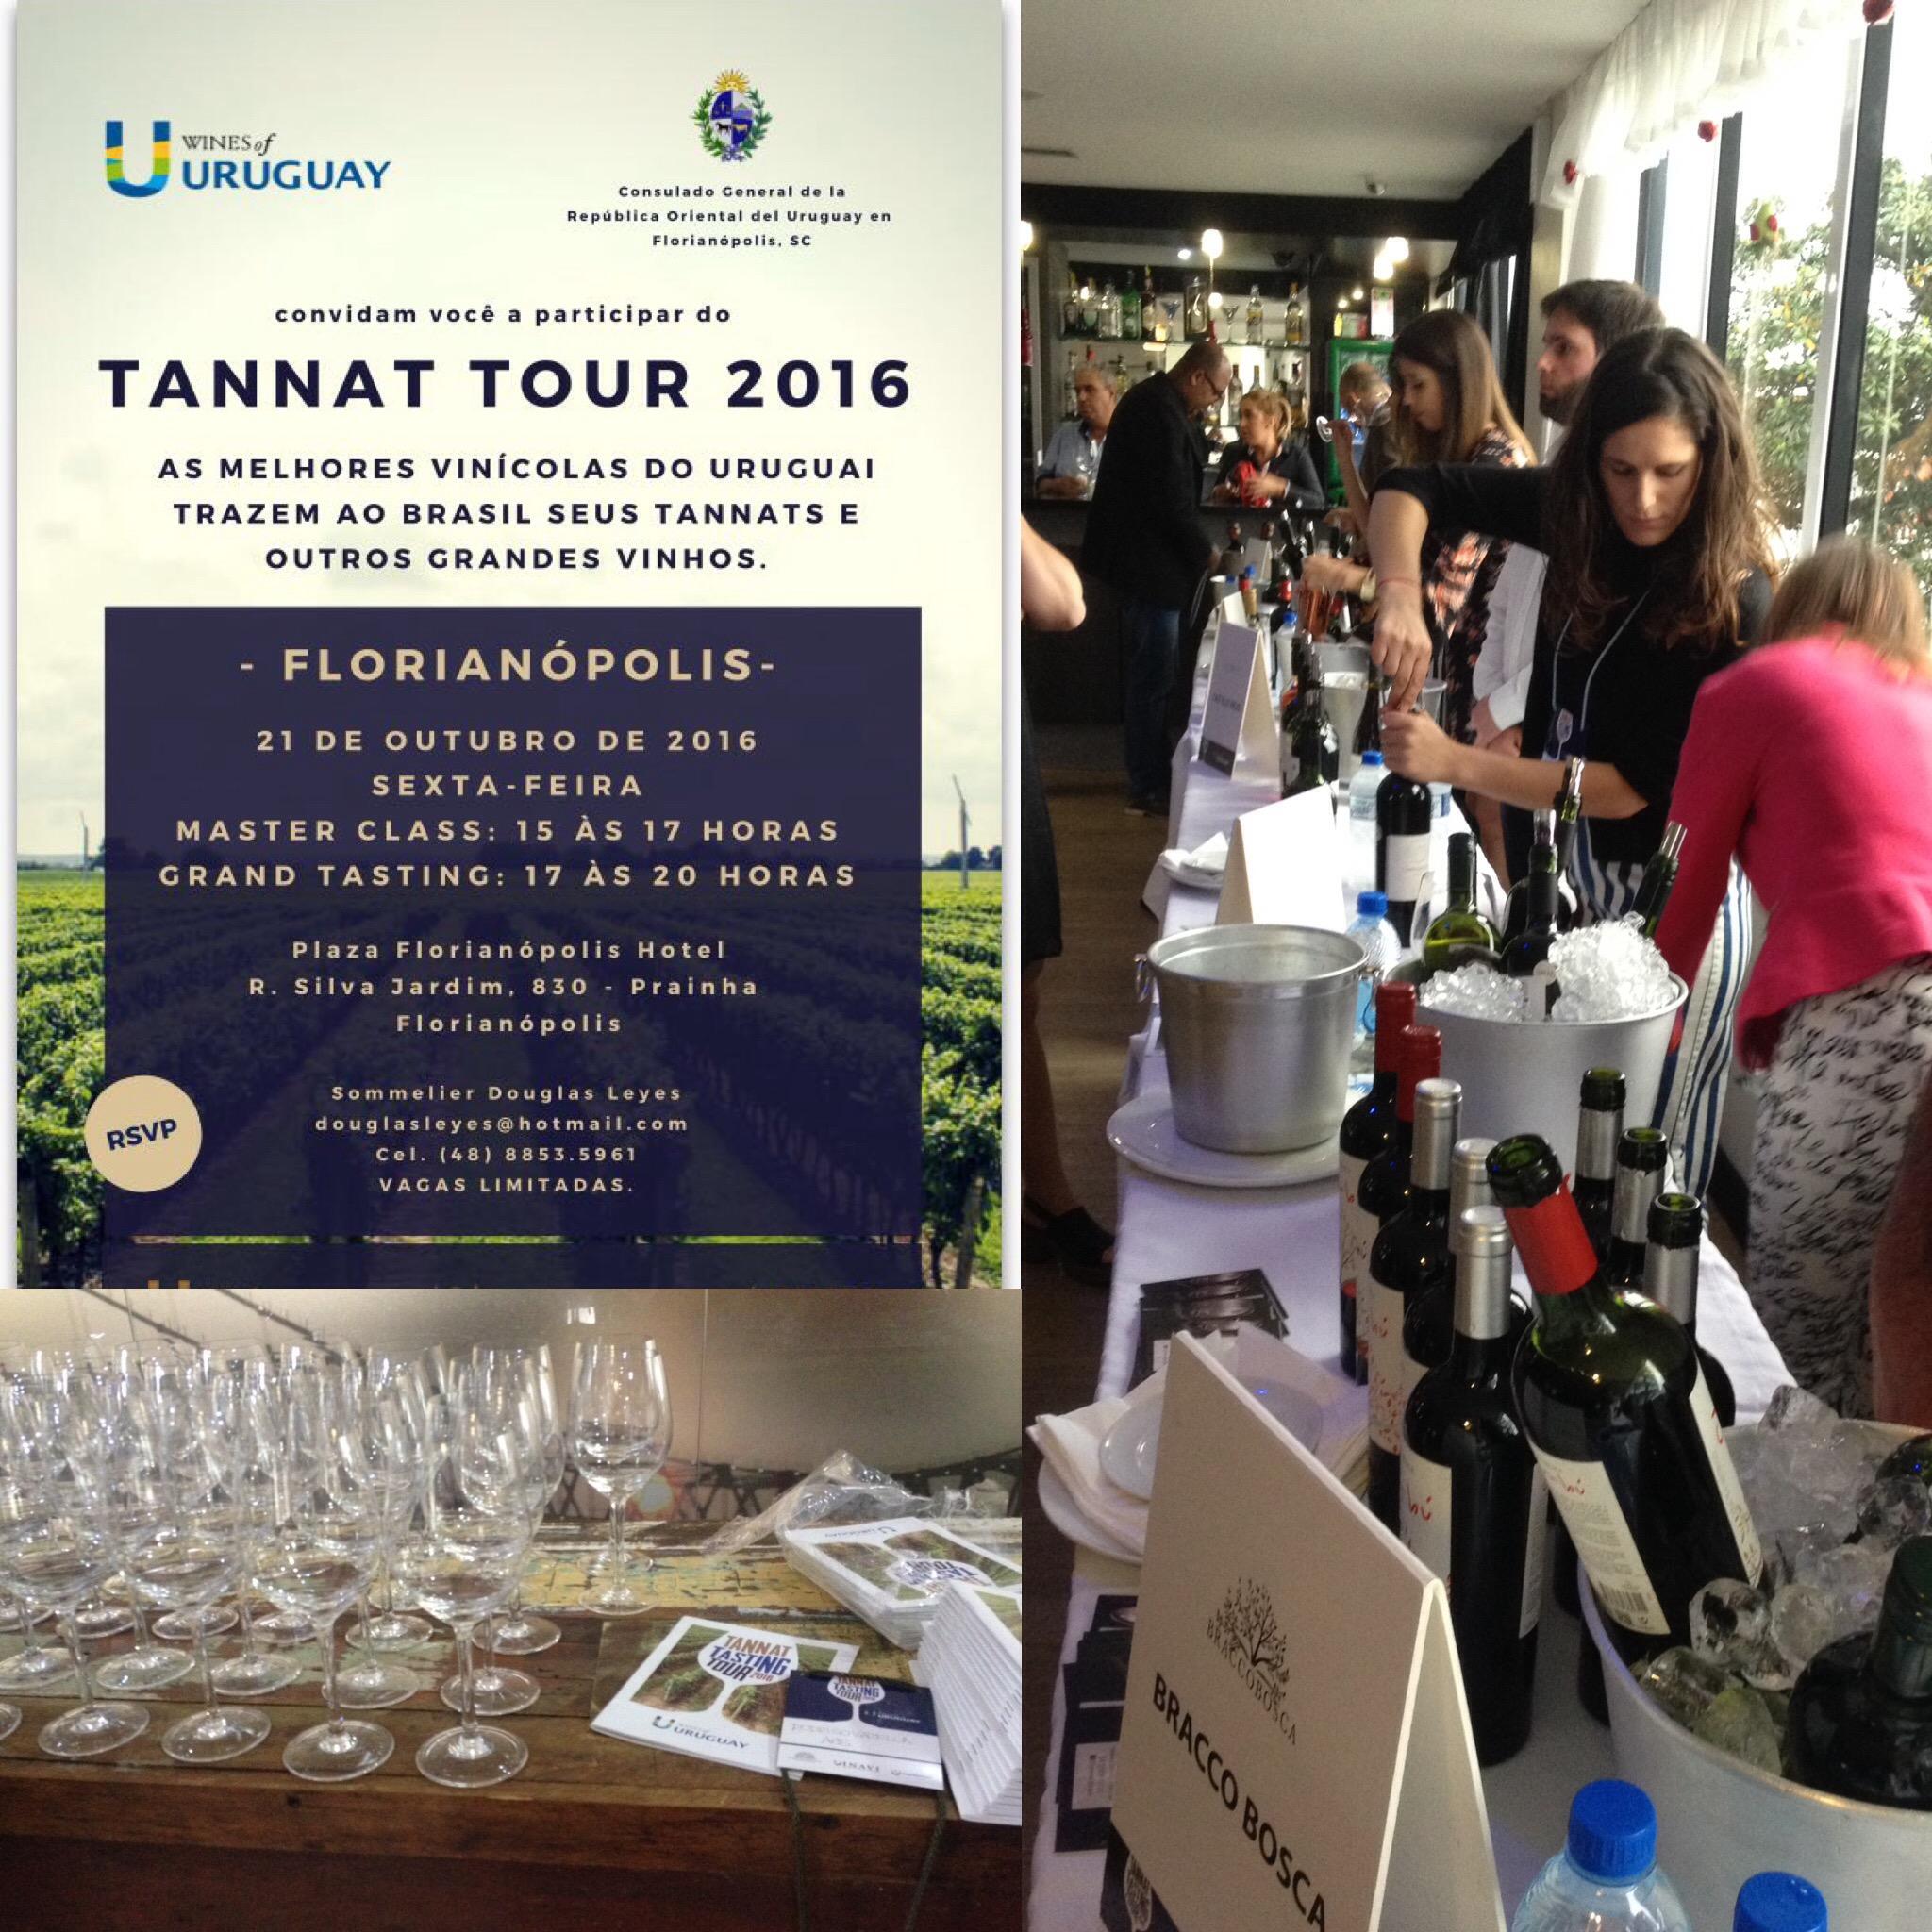 Tannat tour 2016